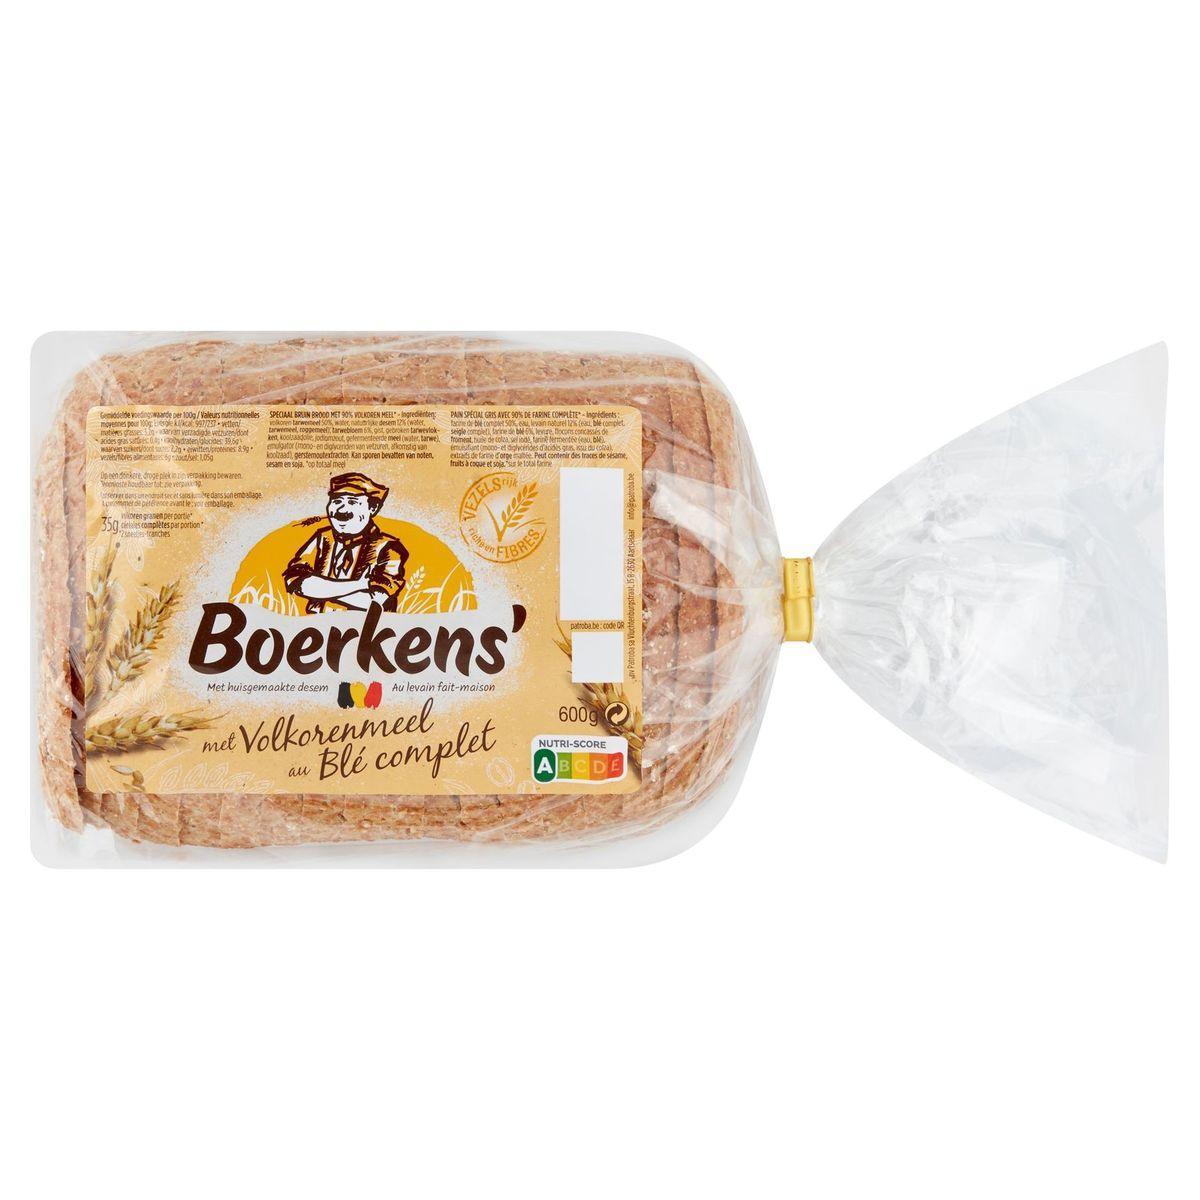 Boerkens' Grains Complets 600 g